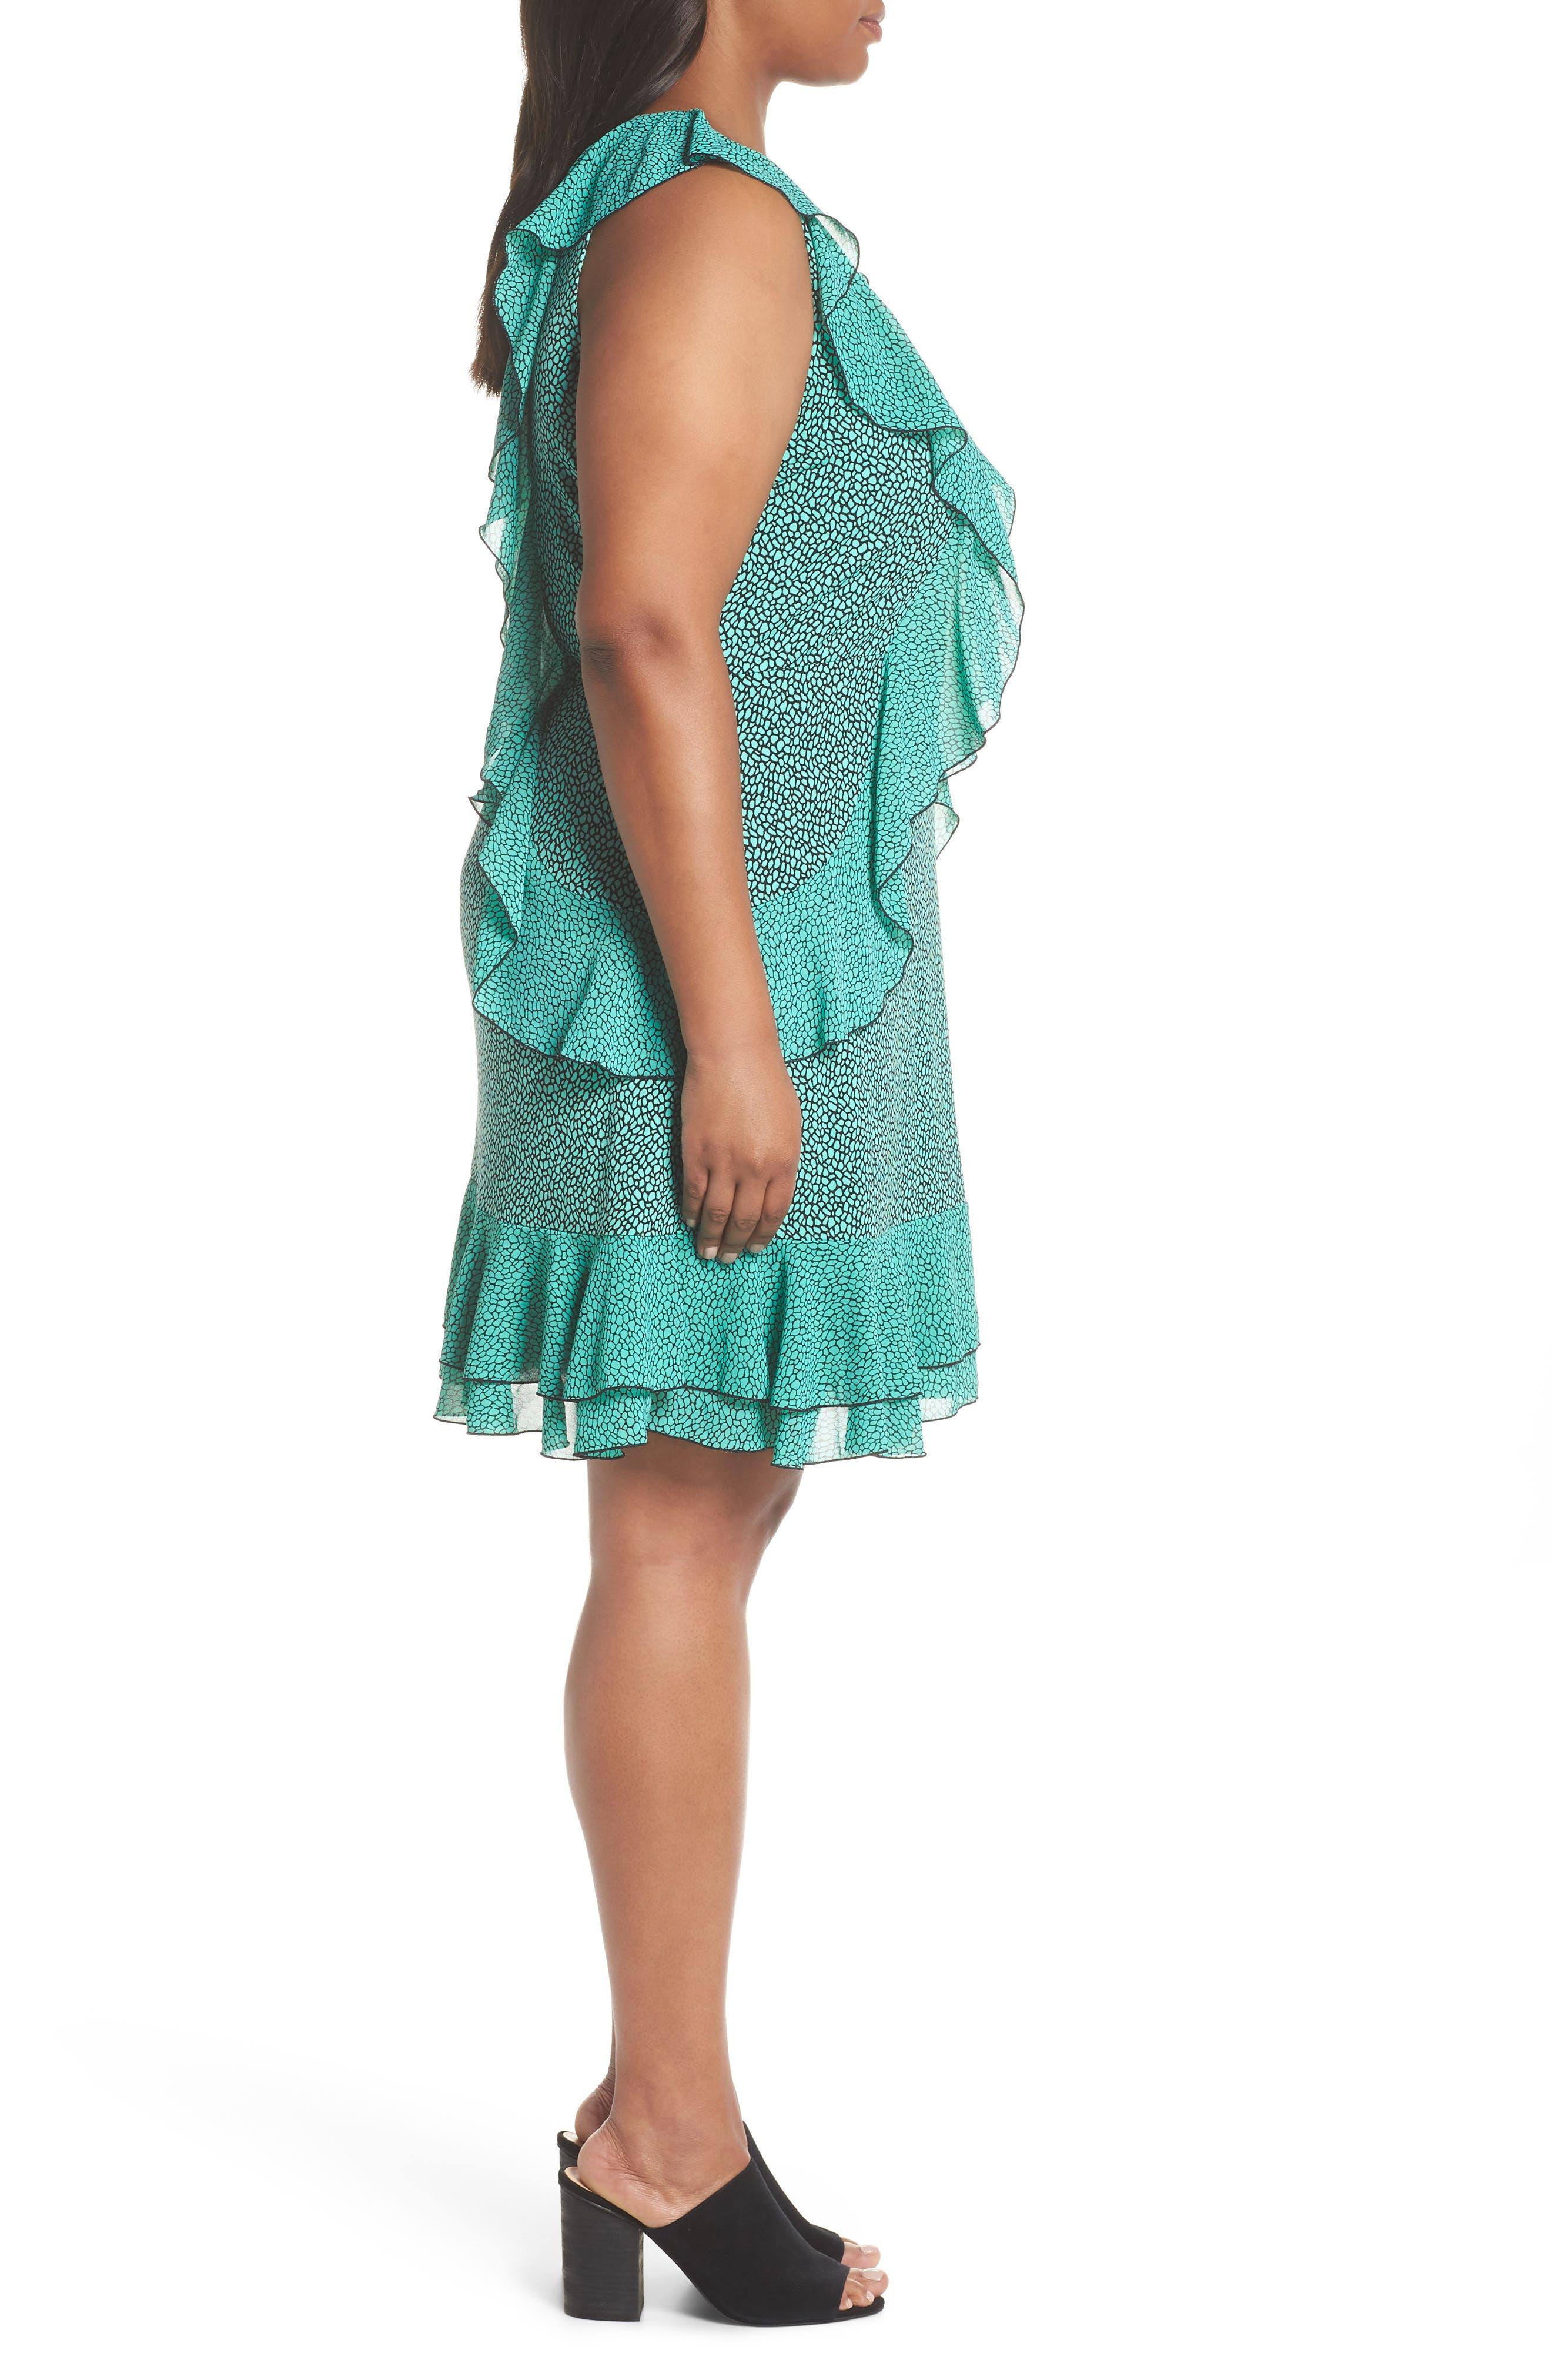 Cascade Ruffle Dress,                             Alternate thumbnail 3, color,                             AQUA/ BLACK